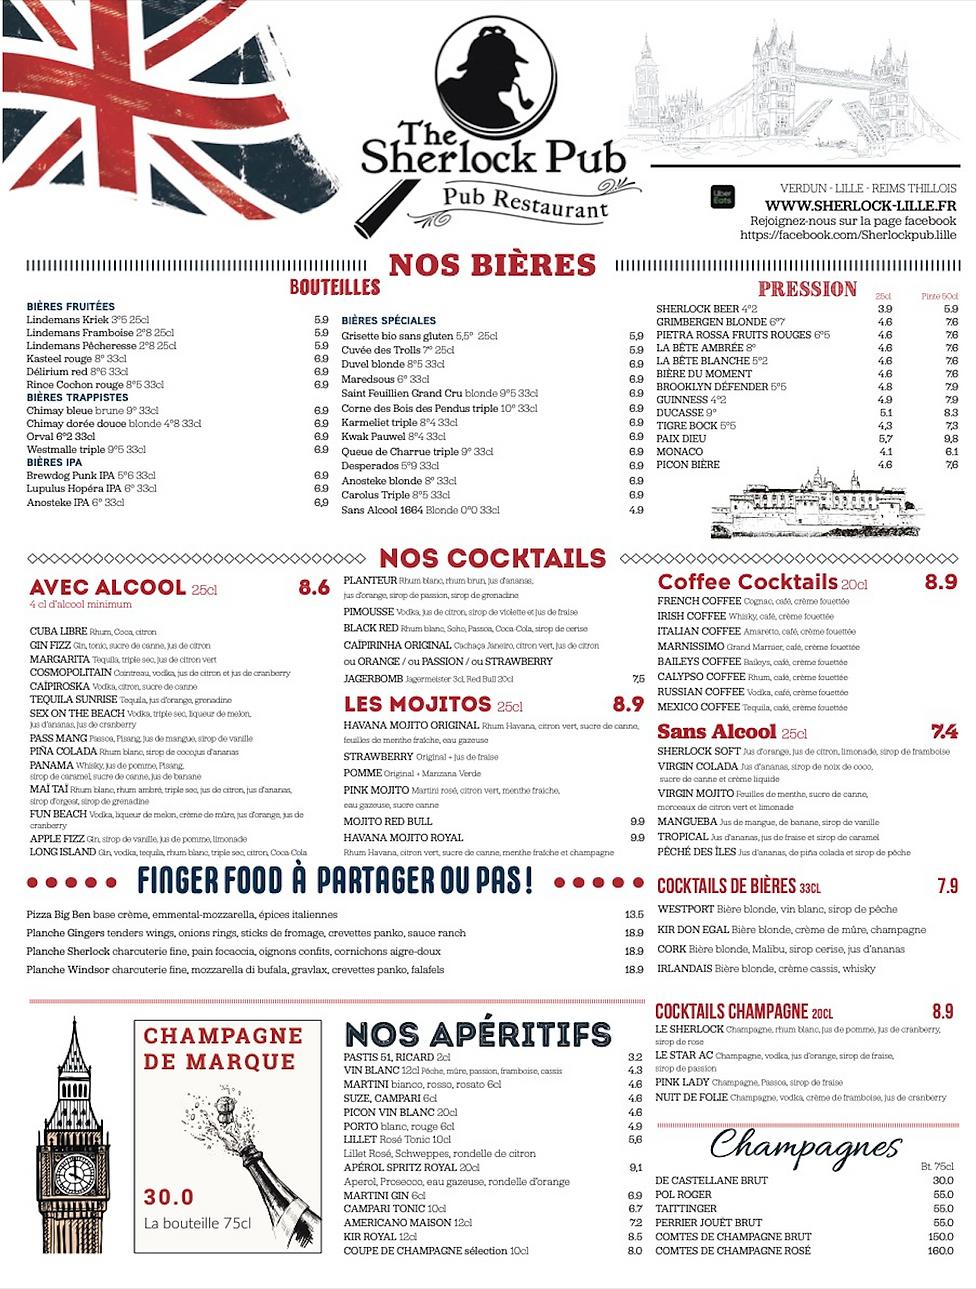 1 Restaurant Lille Brasserie Lille - The Sherlock Pub Lille.png